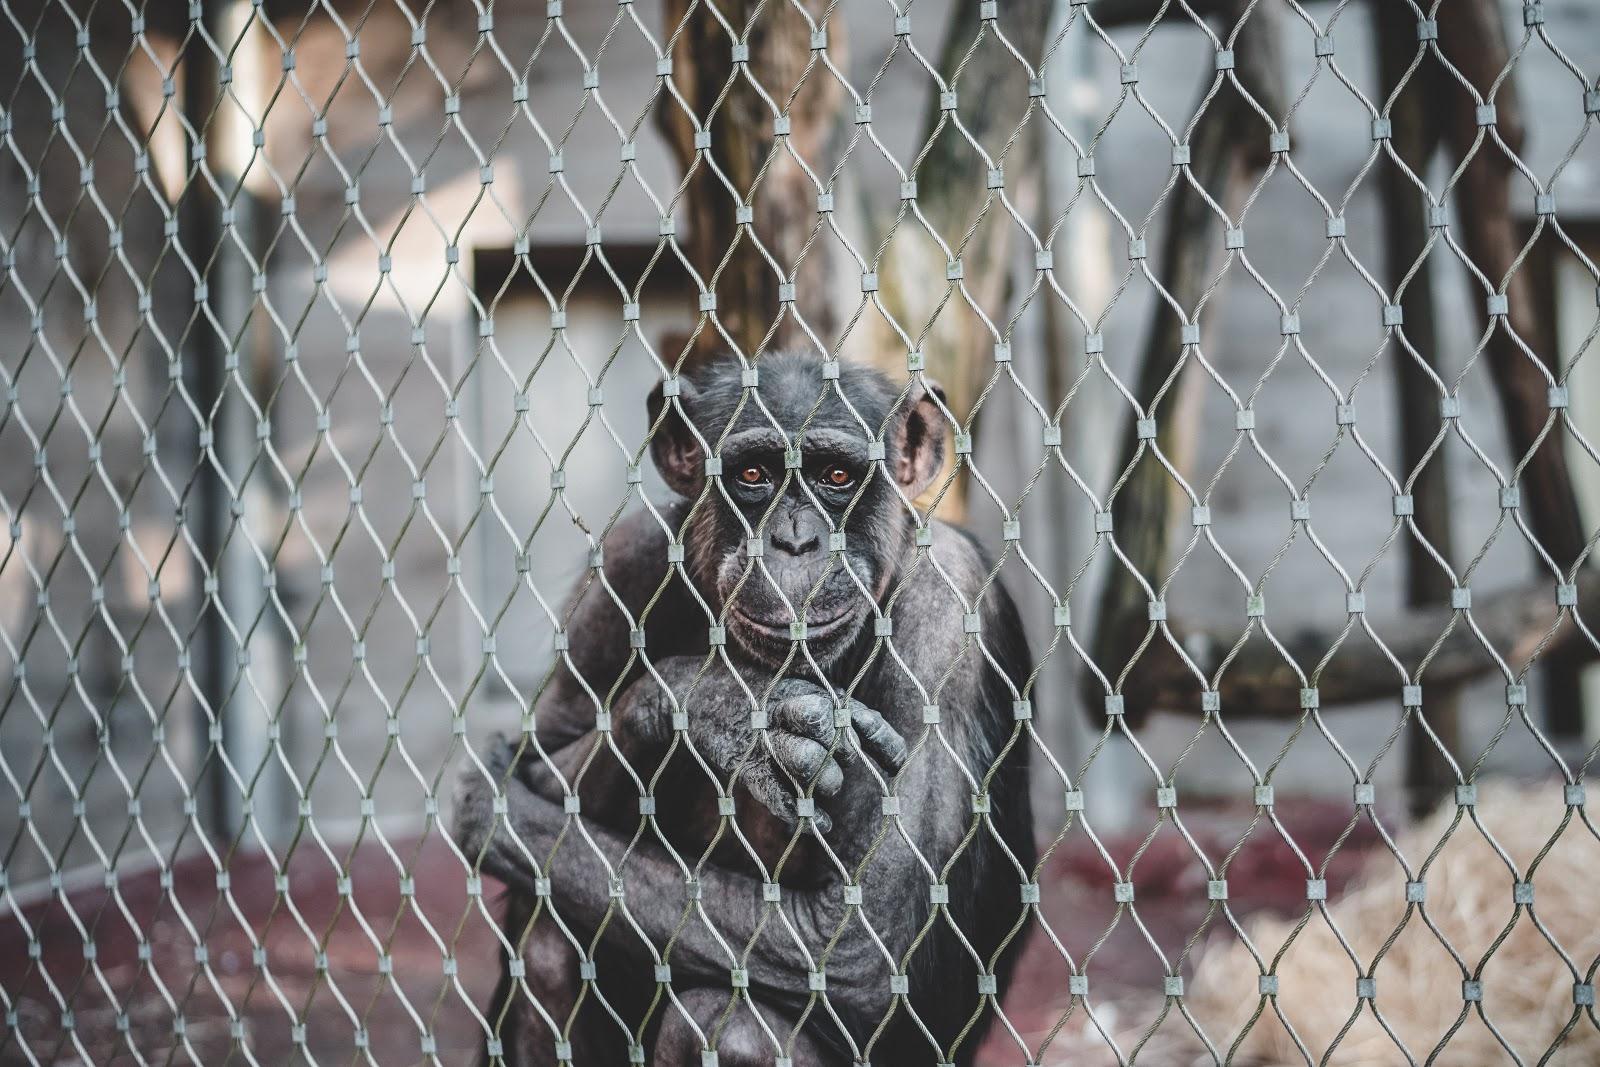 Chimpanzee shot through a fence at a zoo